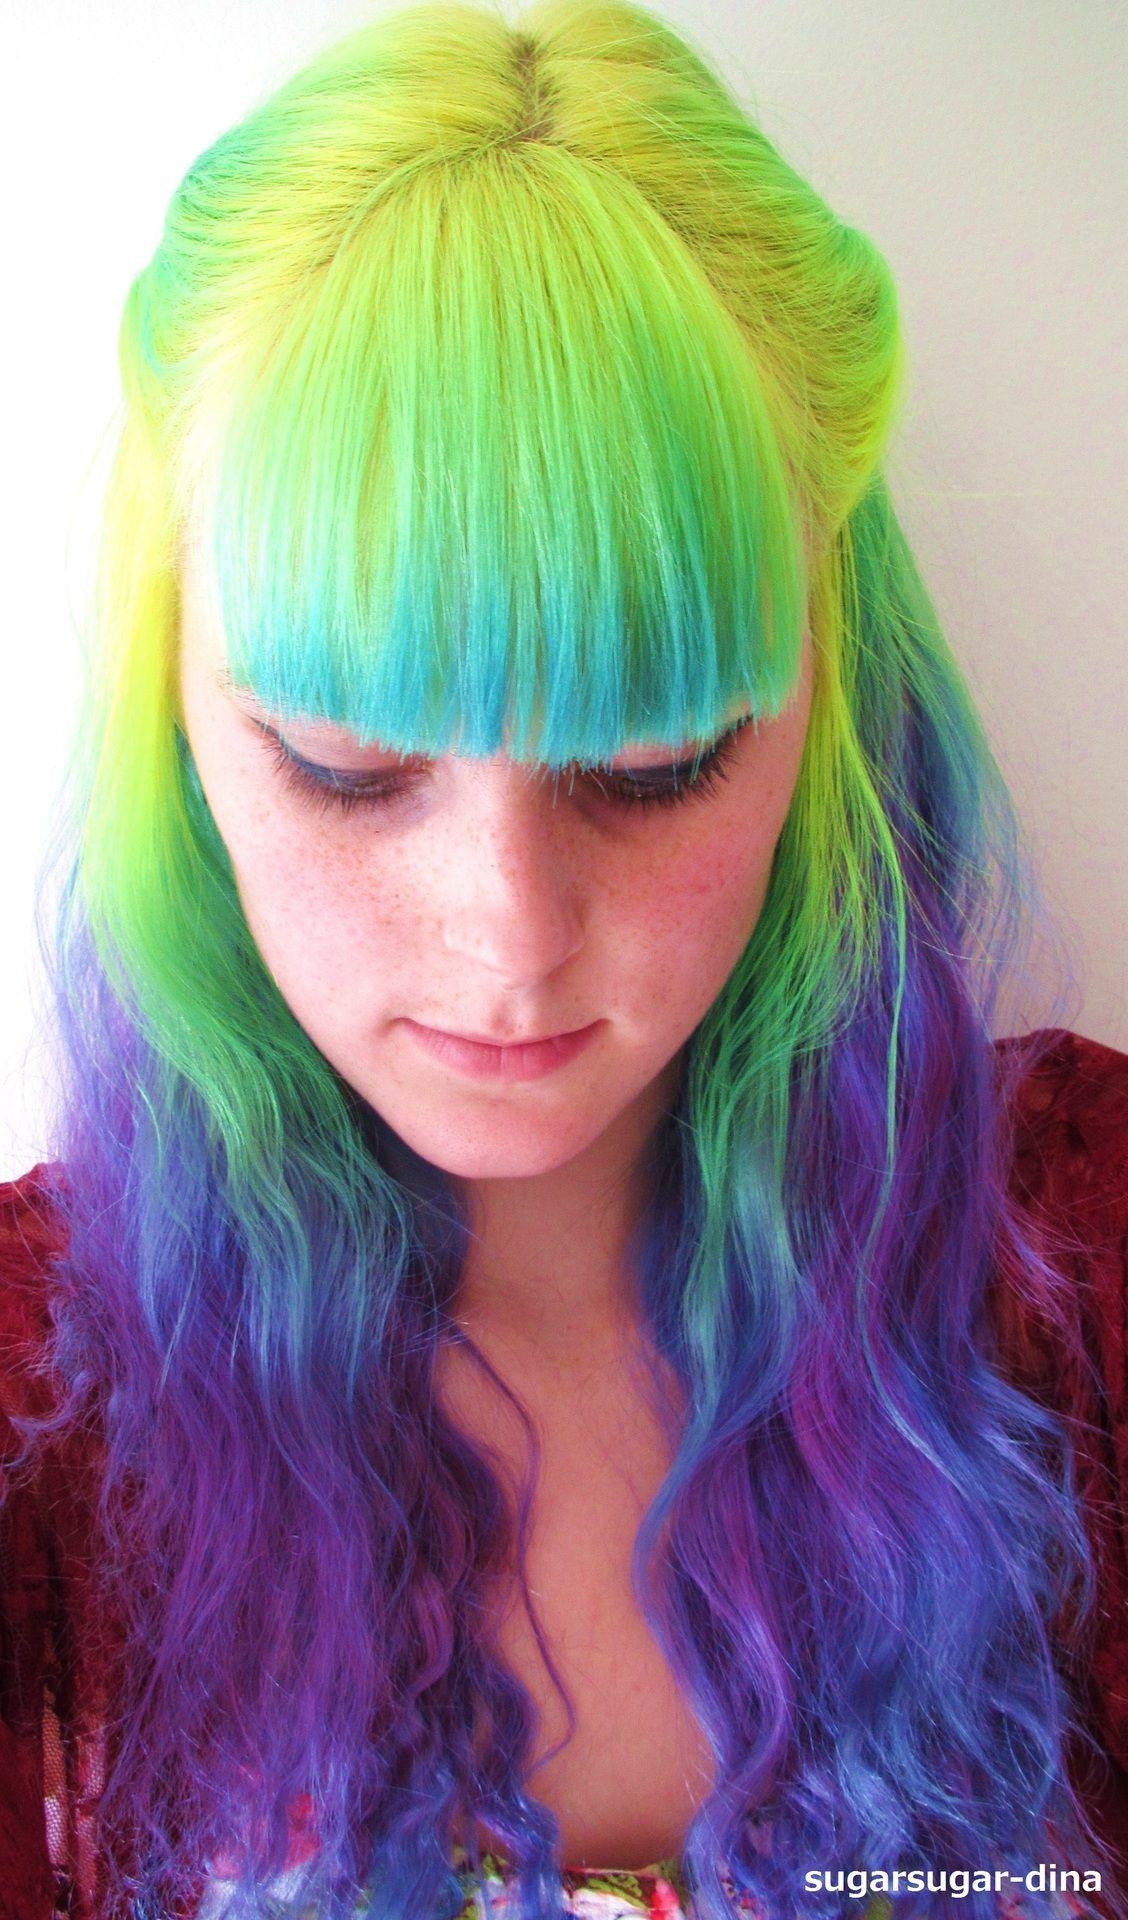 Park Art My WordPress Blog_Neon Yellow Green Hair Dye